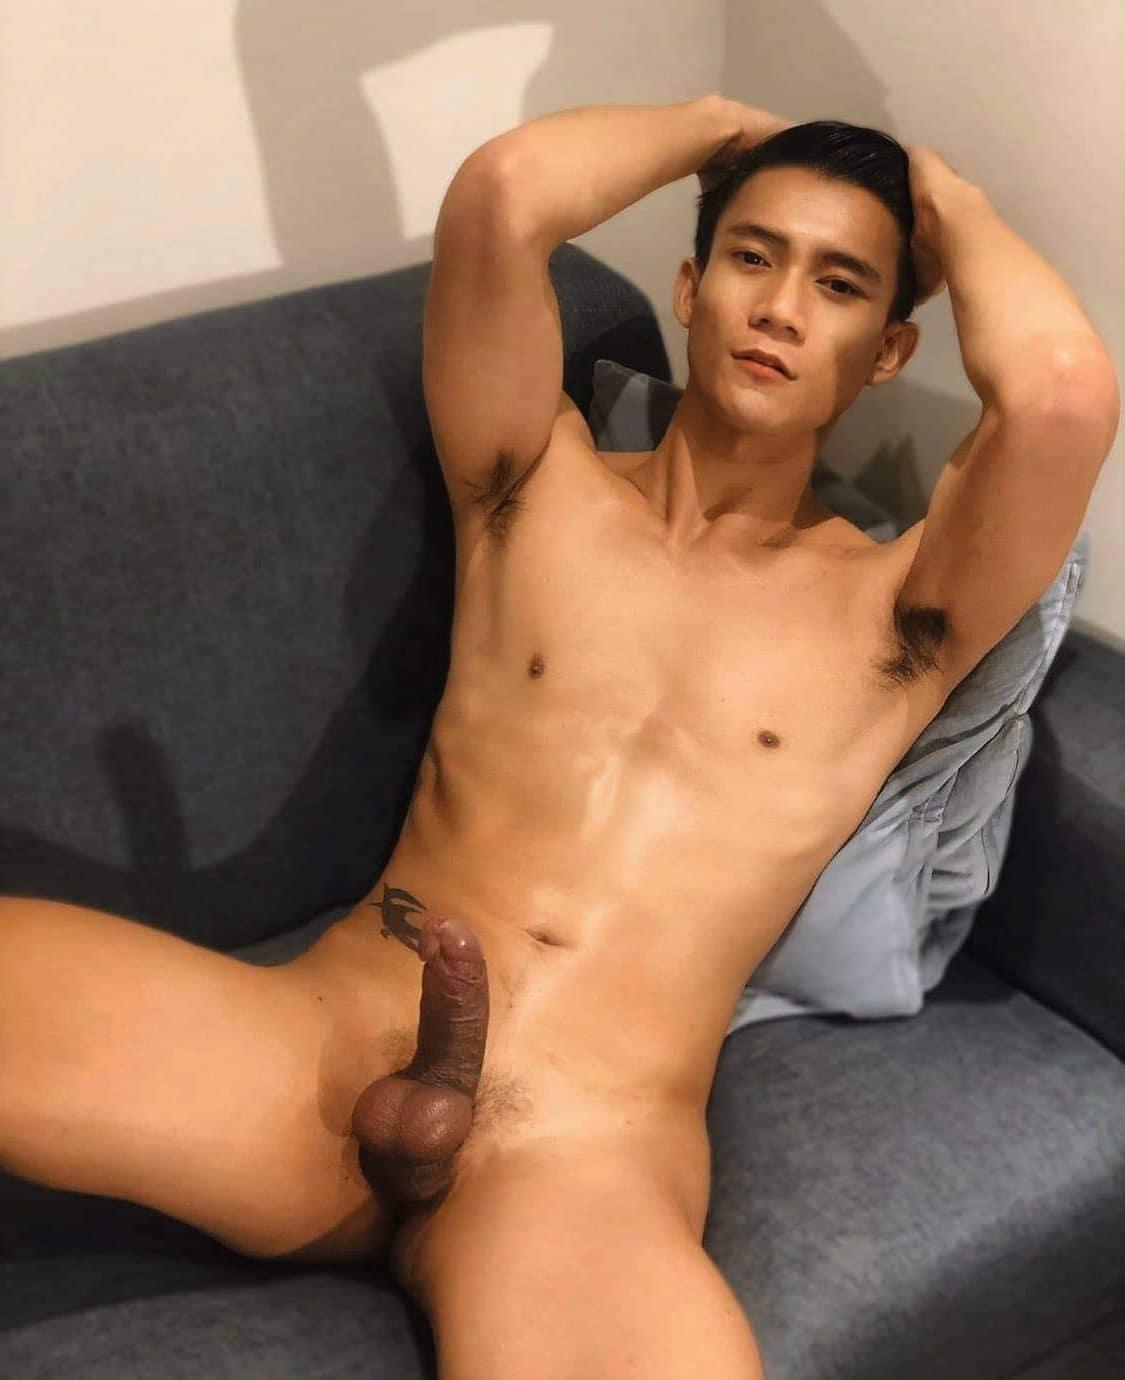 Asian jock with hard cock